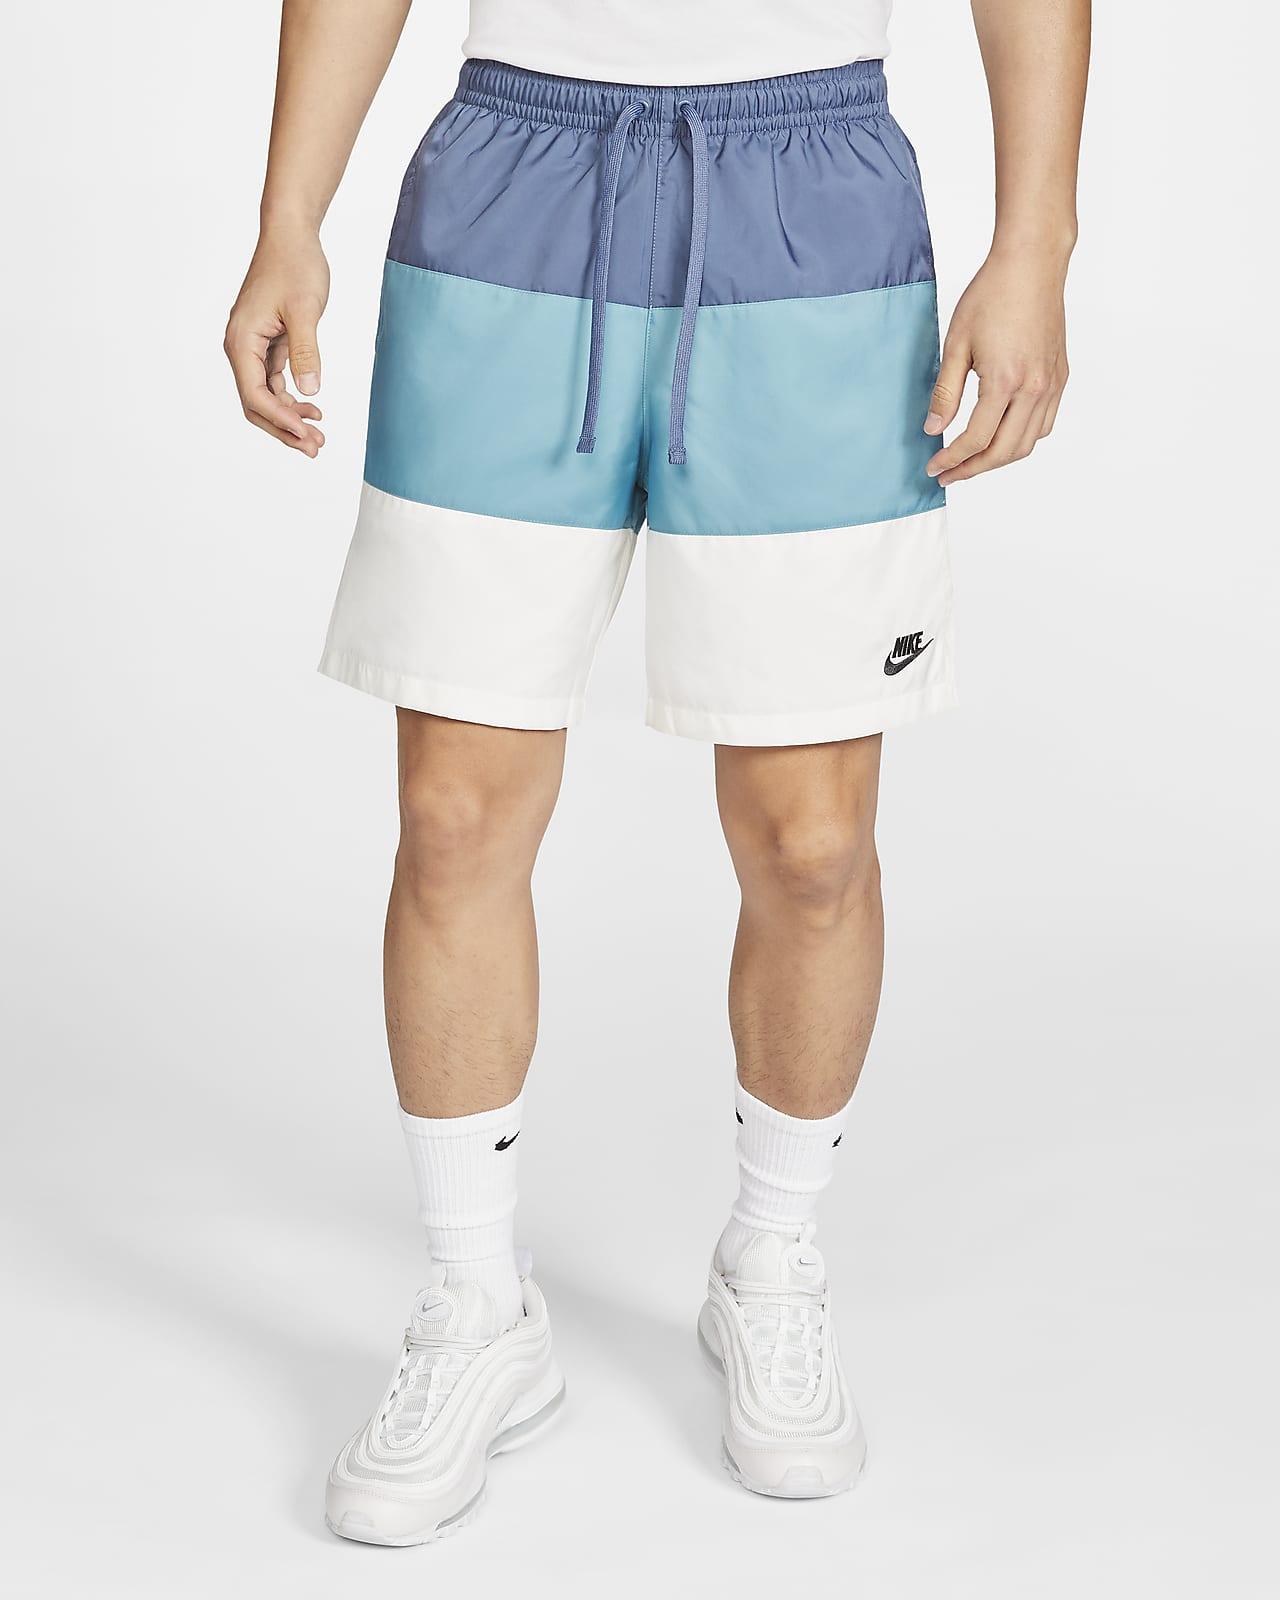 Nike Sportswear City Edition 男款梭織短褲